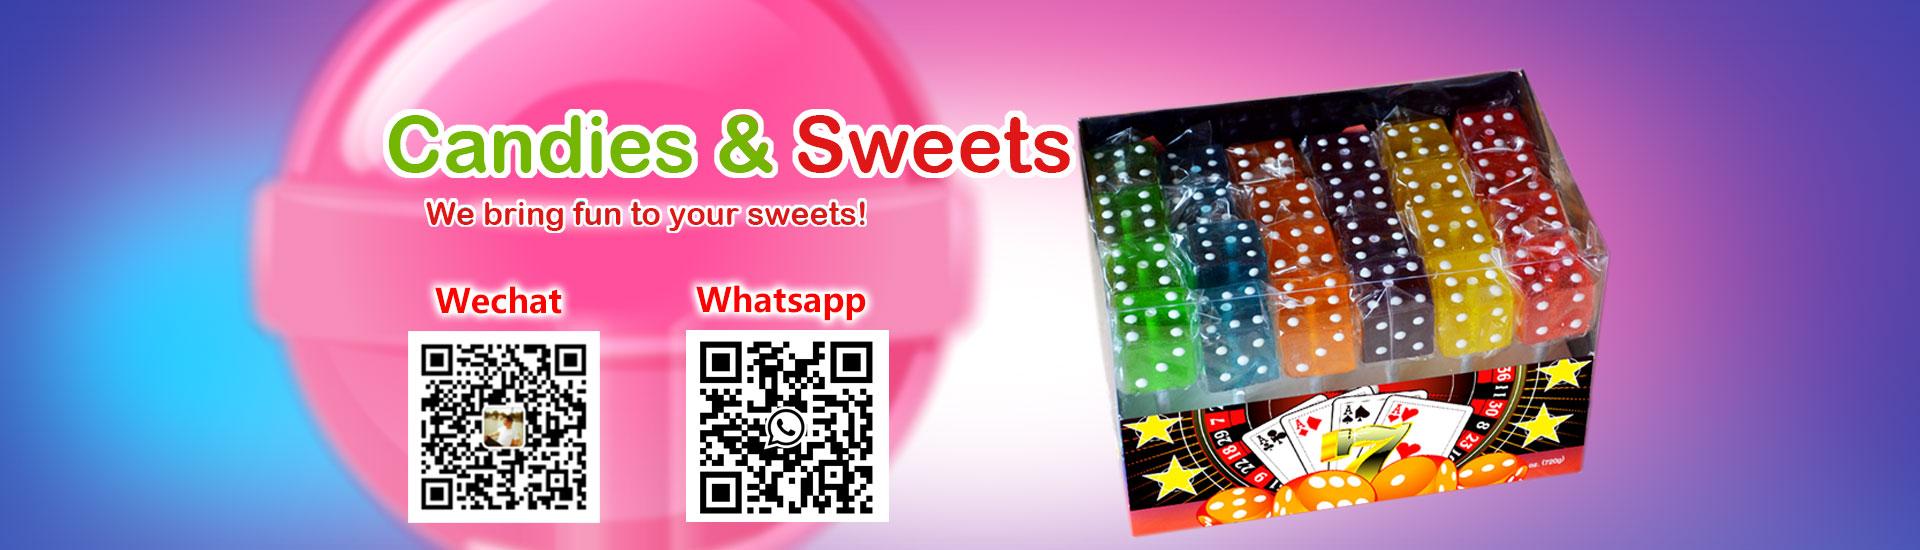 candy manufacturer